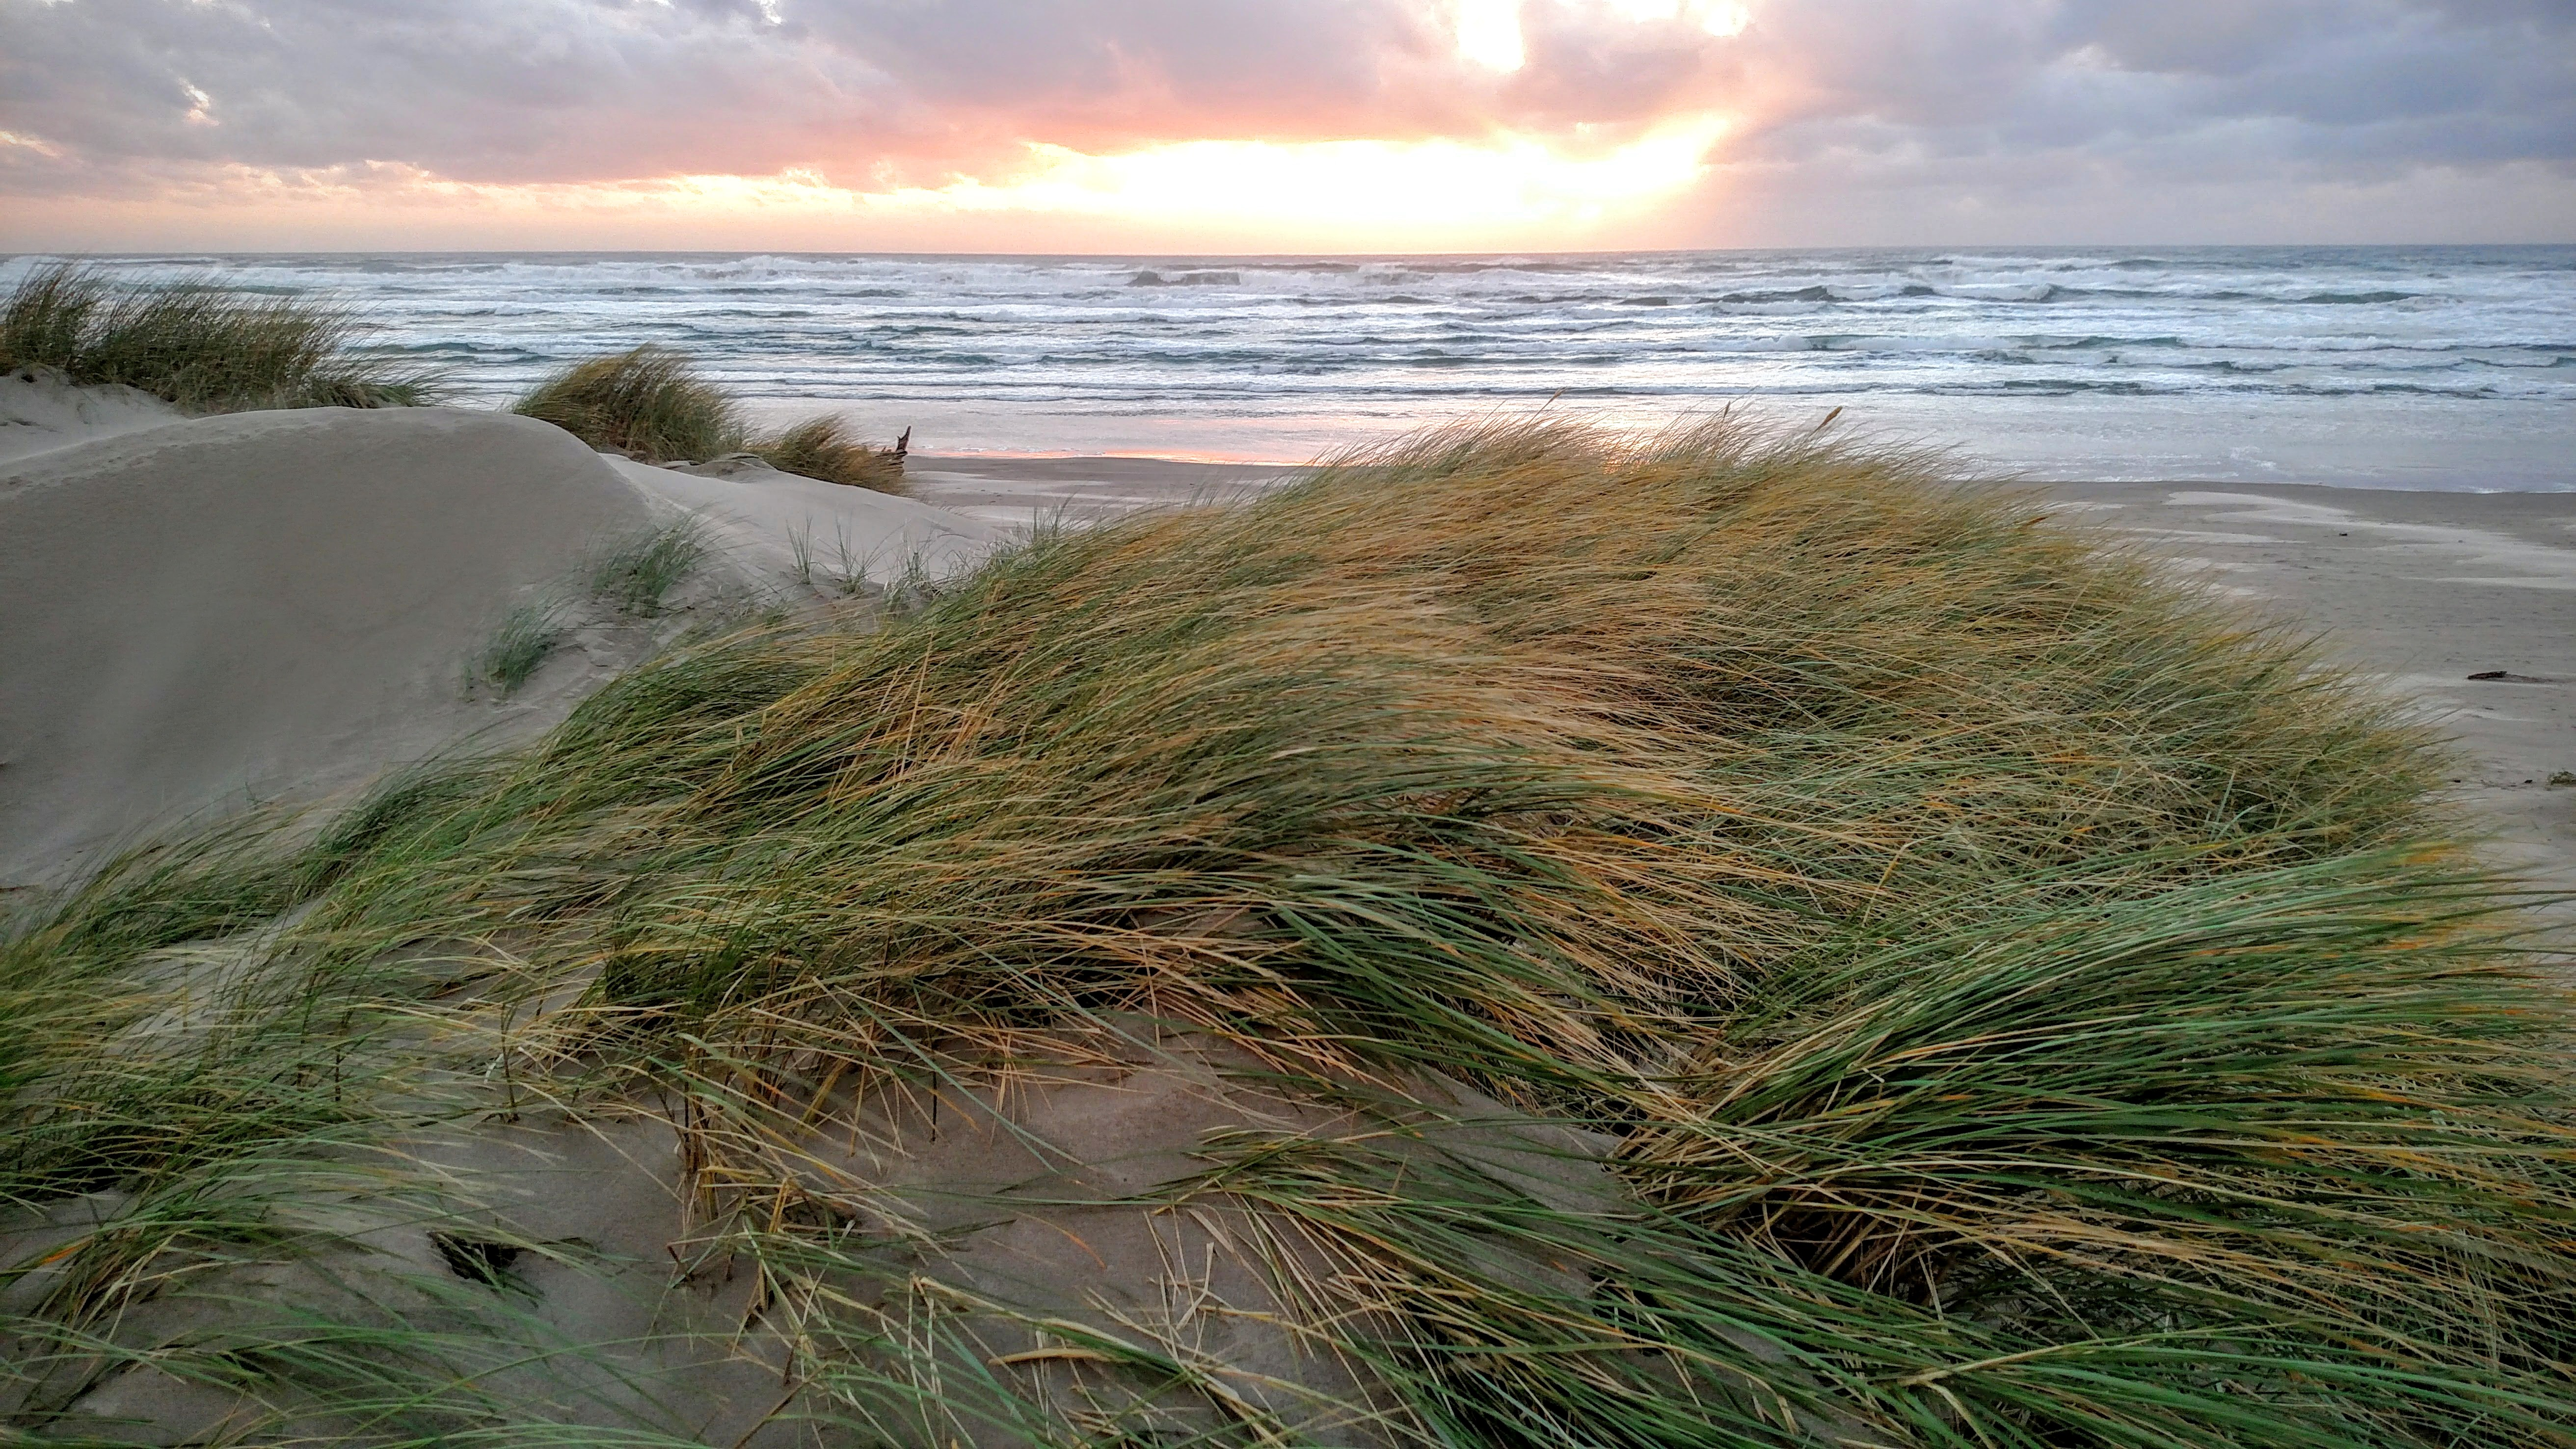 Chapman Beach Sand Dunes